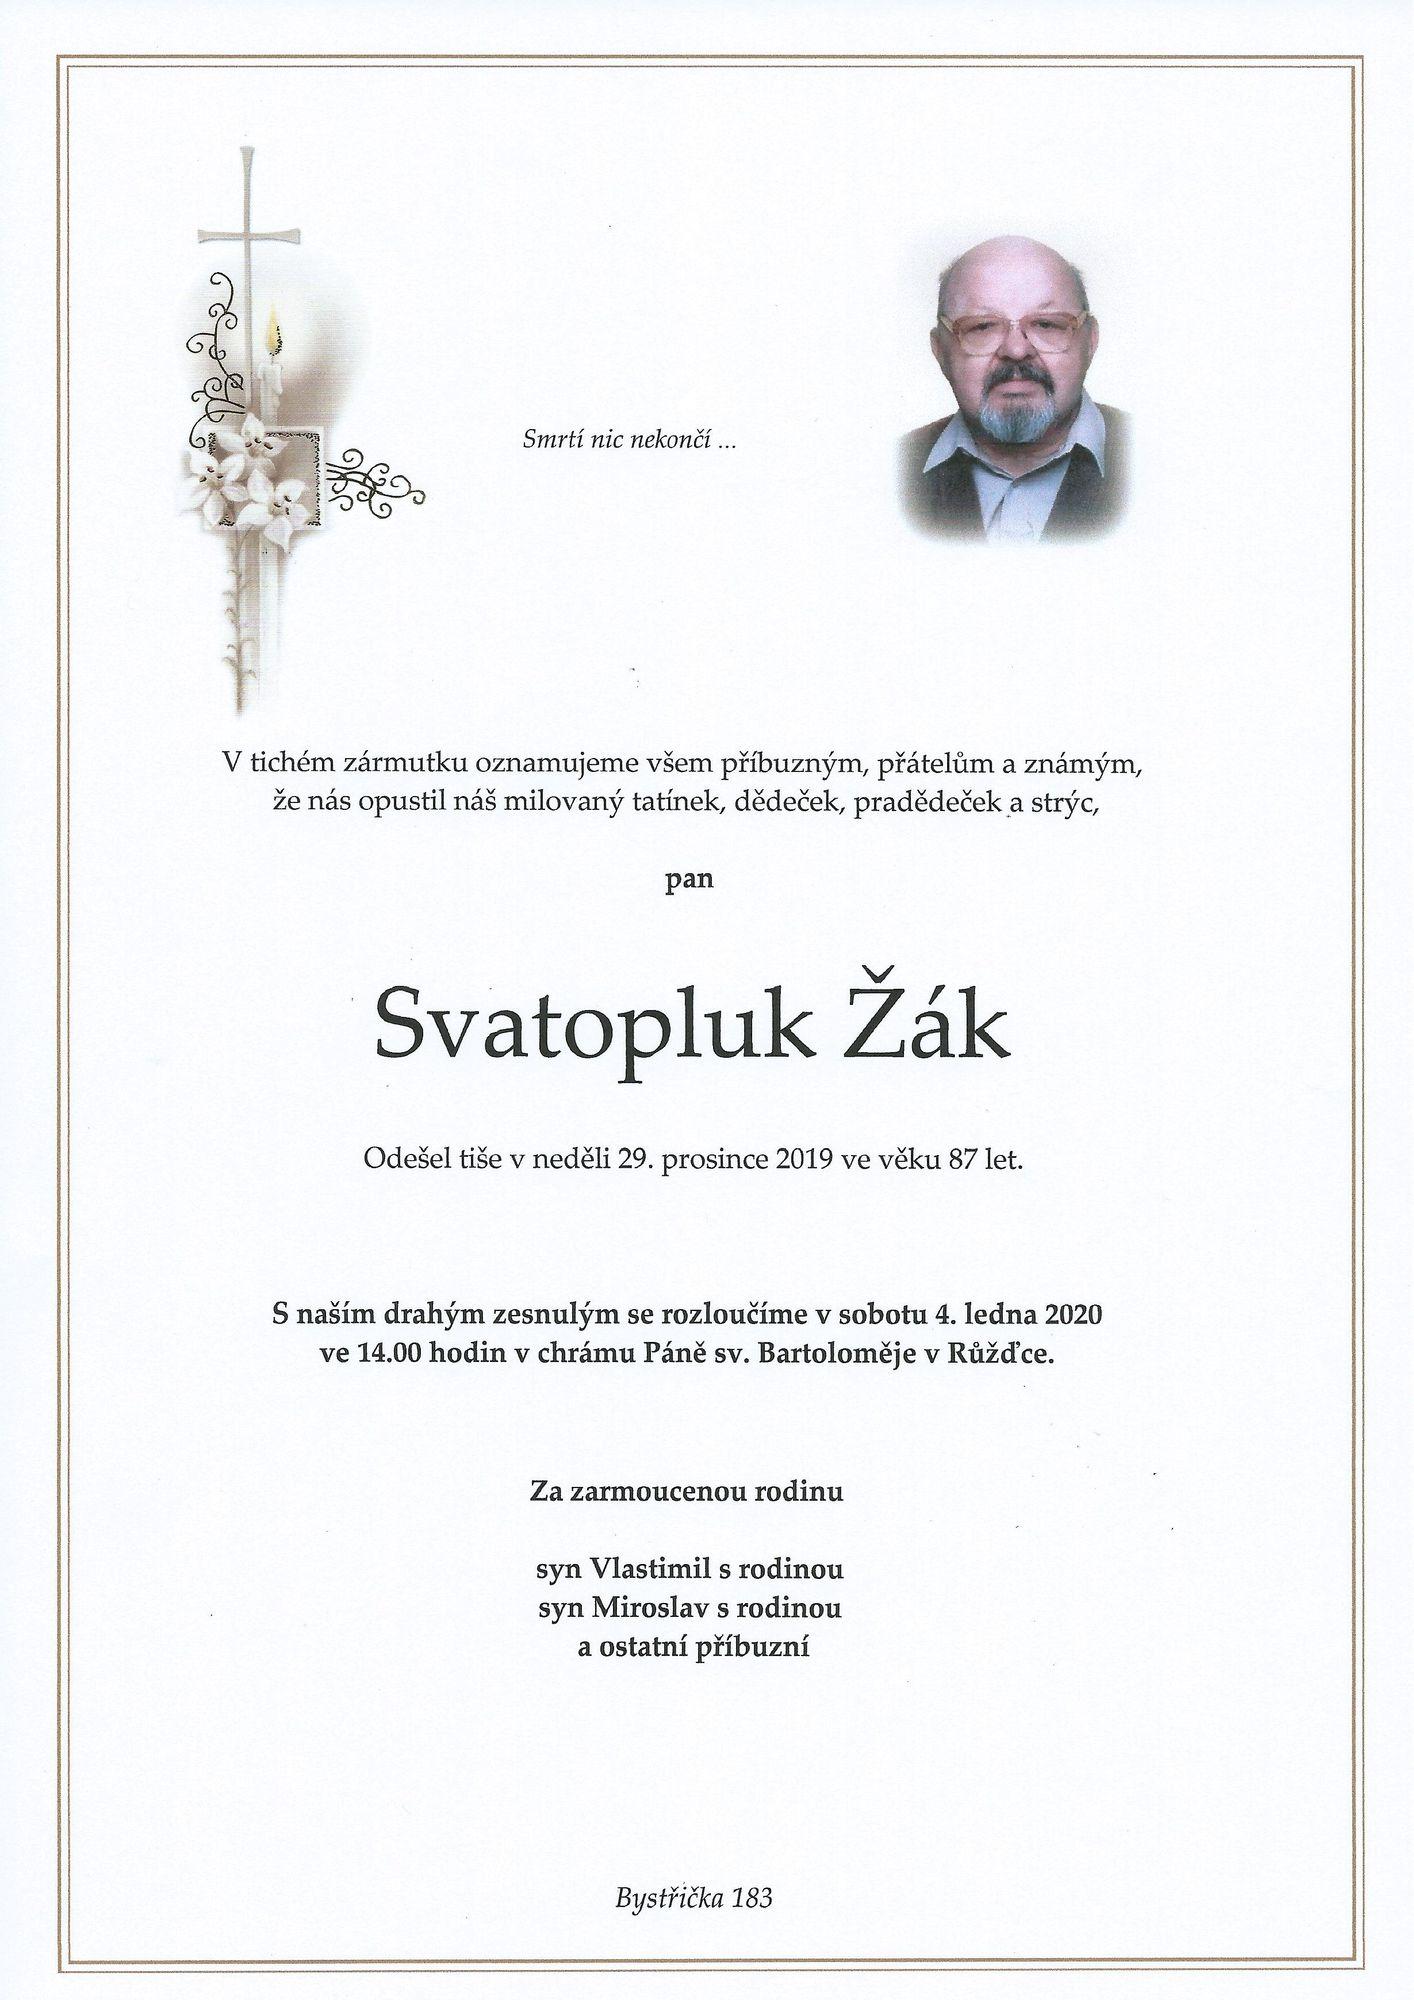 Svatopluk Žák